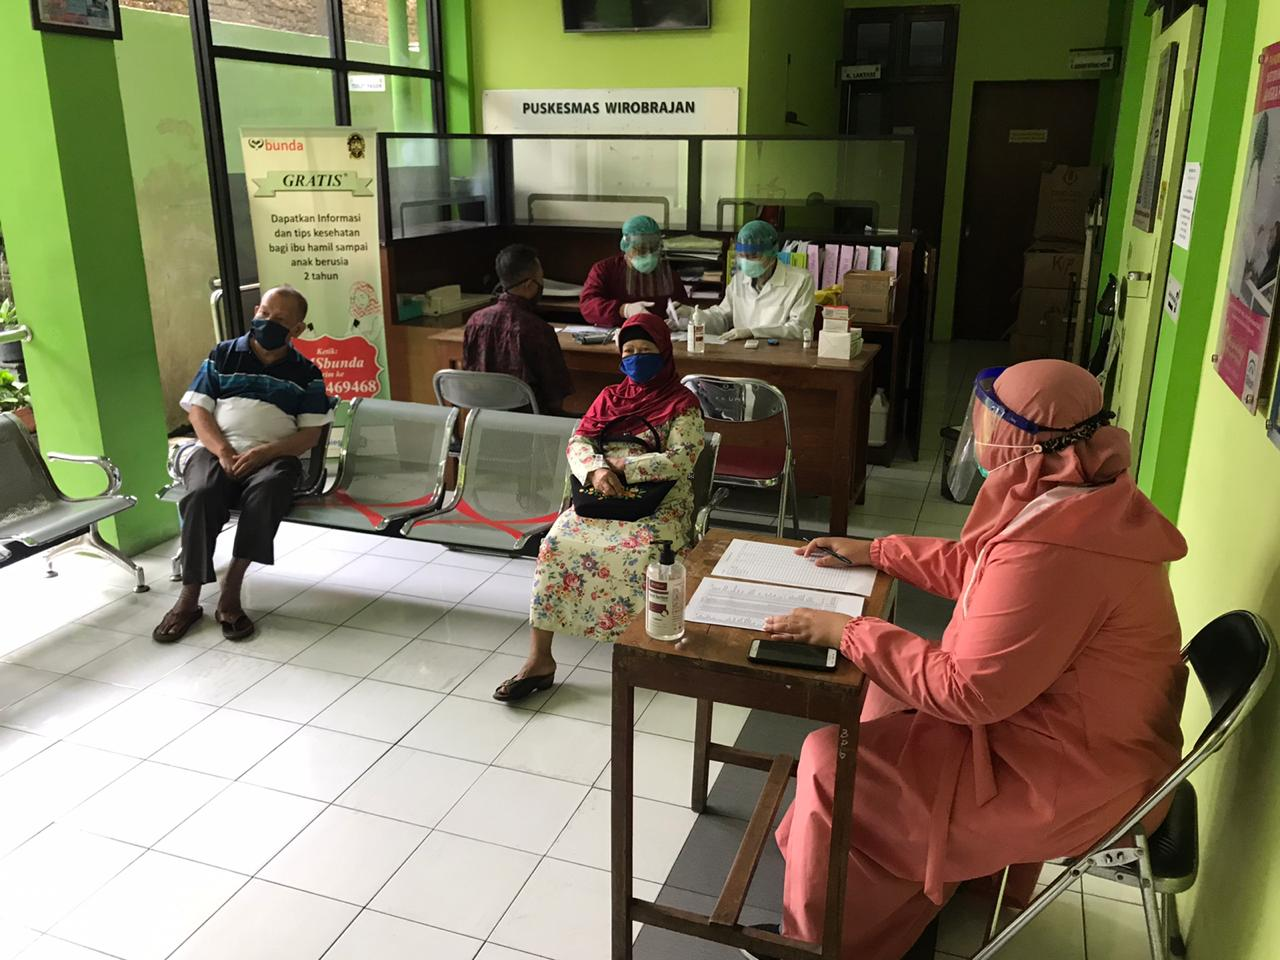 Pelaksanaan Skrening Lansia di Puskesmas Wirobrajan Yogyakarta Oktober - November 2020